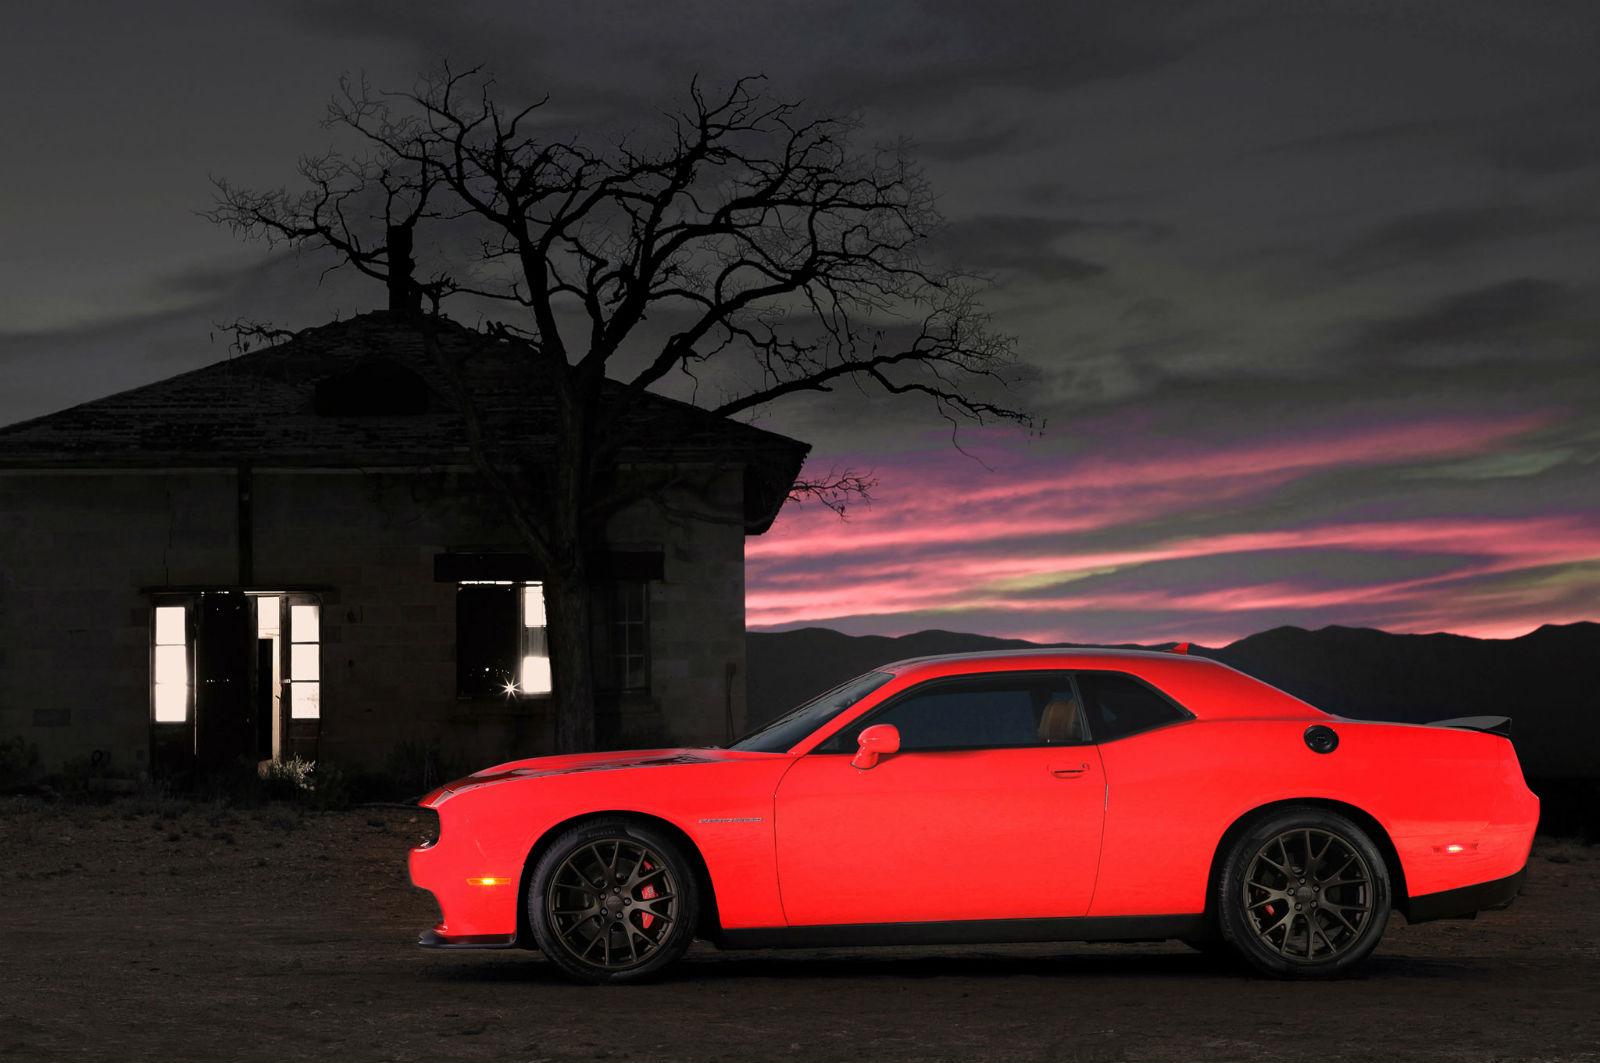 2015 dodge challenger srt hellcat interior hp torque - 2015 Dodge Challenger Srt Hellcat Sepia Laguna Leather